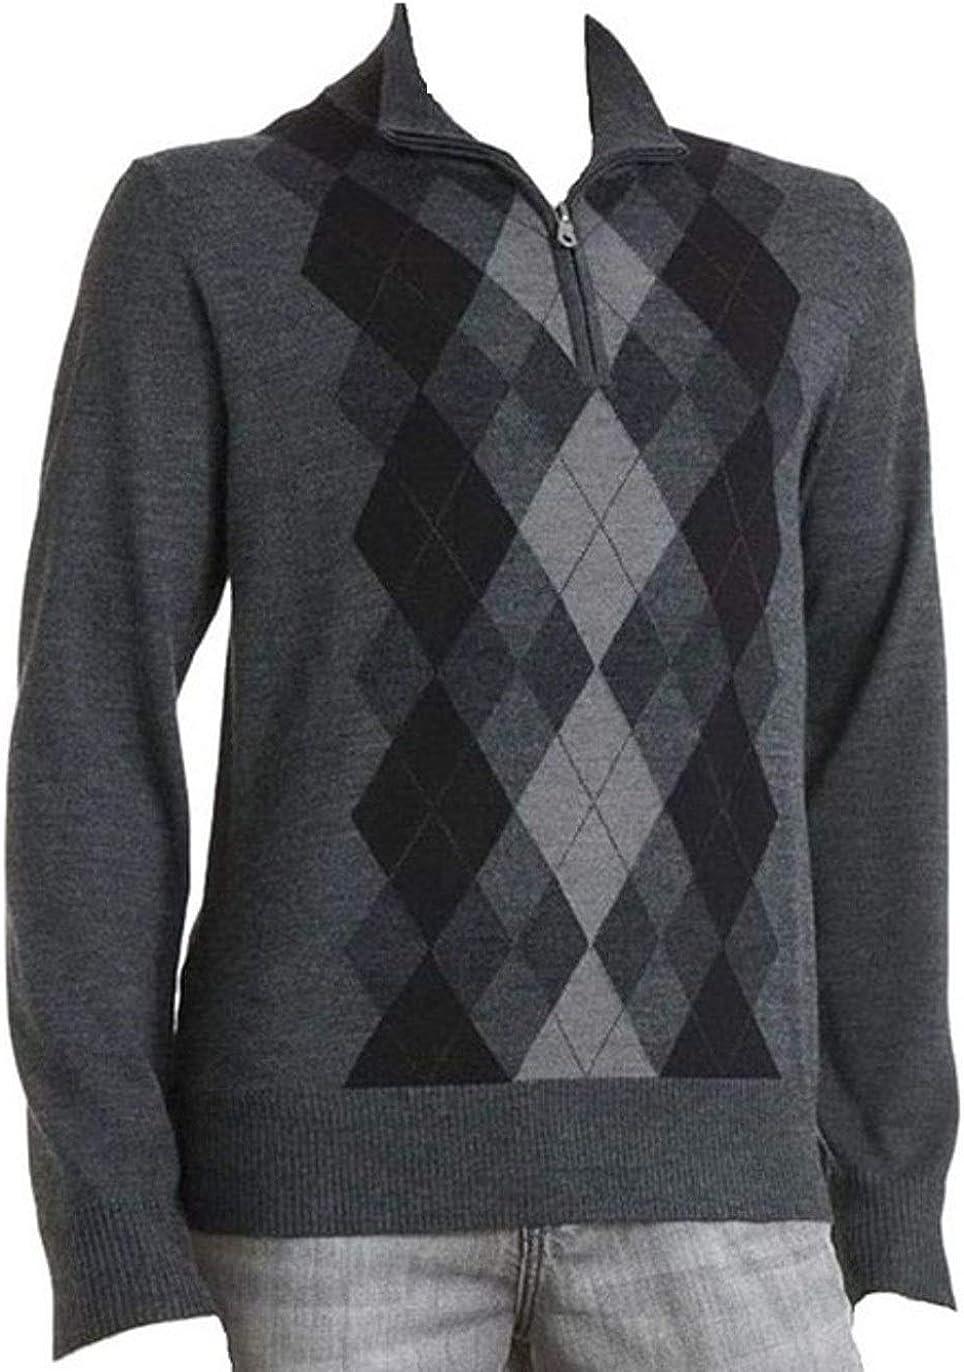 Liz Claiborne's Apt 9 Argyle 1/4 Zip Sweater Merino Wool Blend Sizes Big & Tall Grey